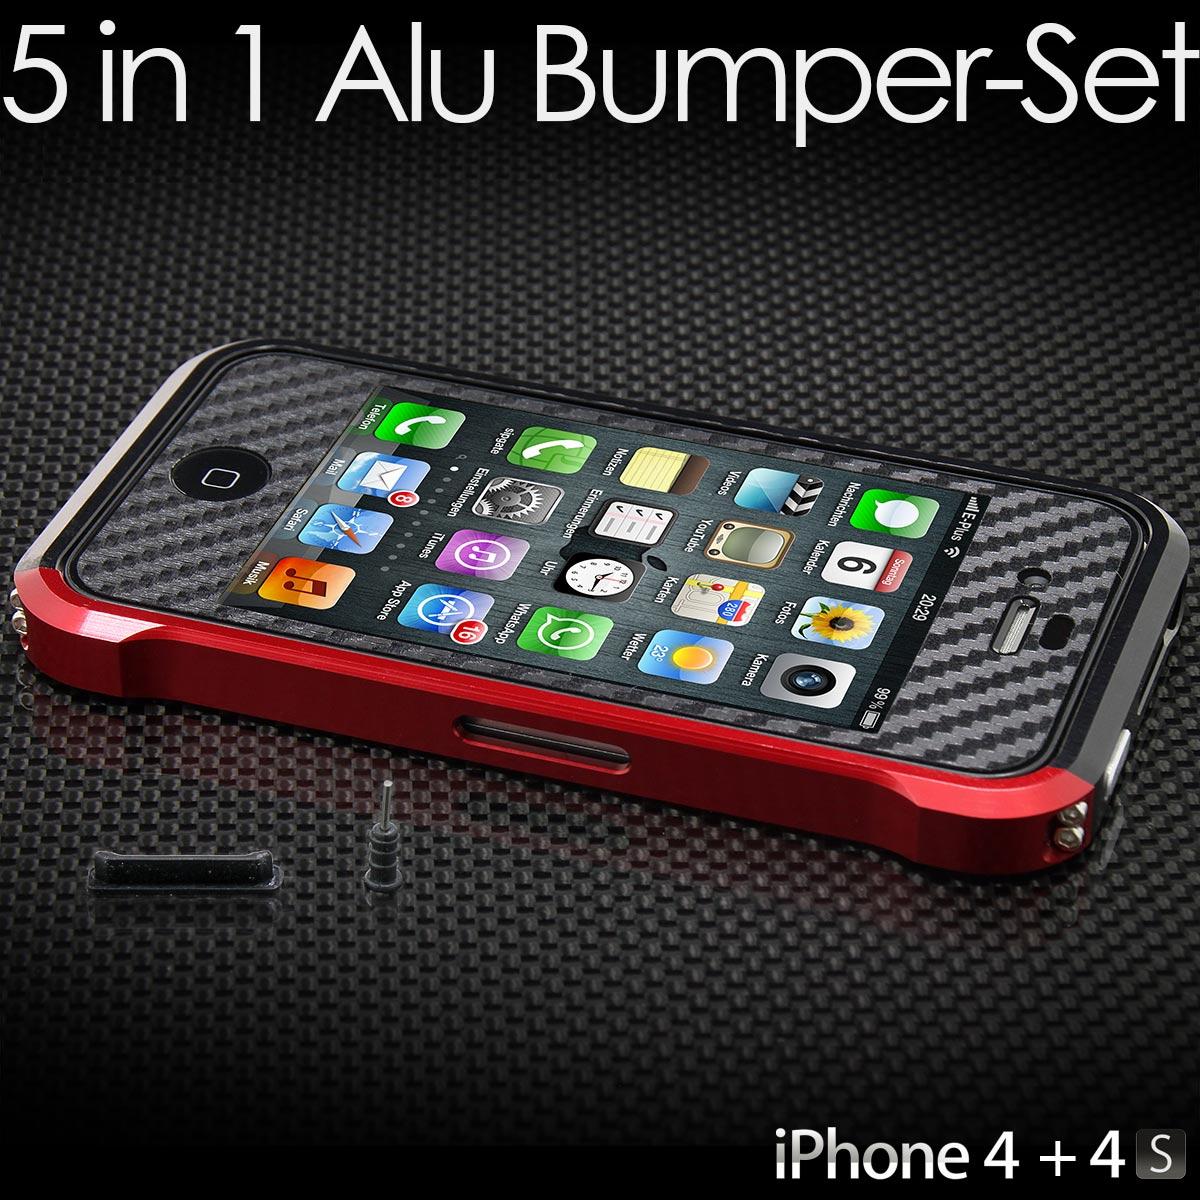 neu iphone 4 4s schutz set aluminium h lle case tasche. Black Bedroom Furniture Sets. Home Design Ideas